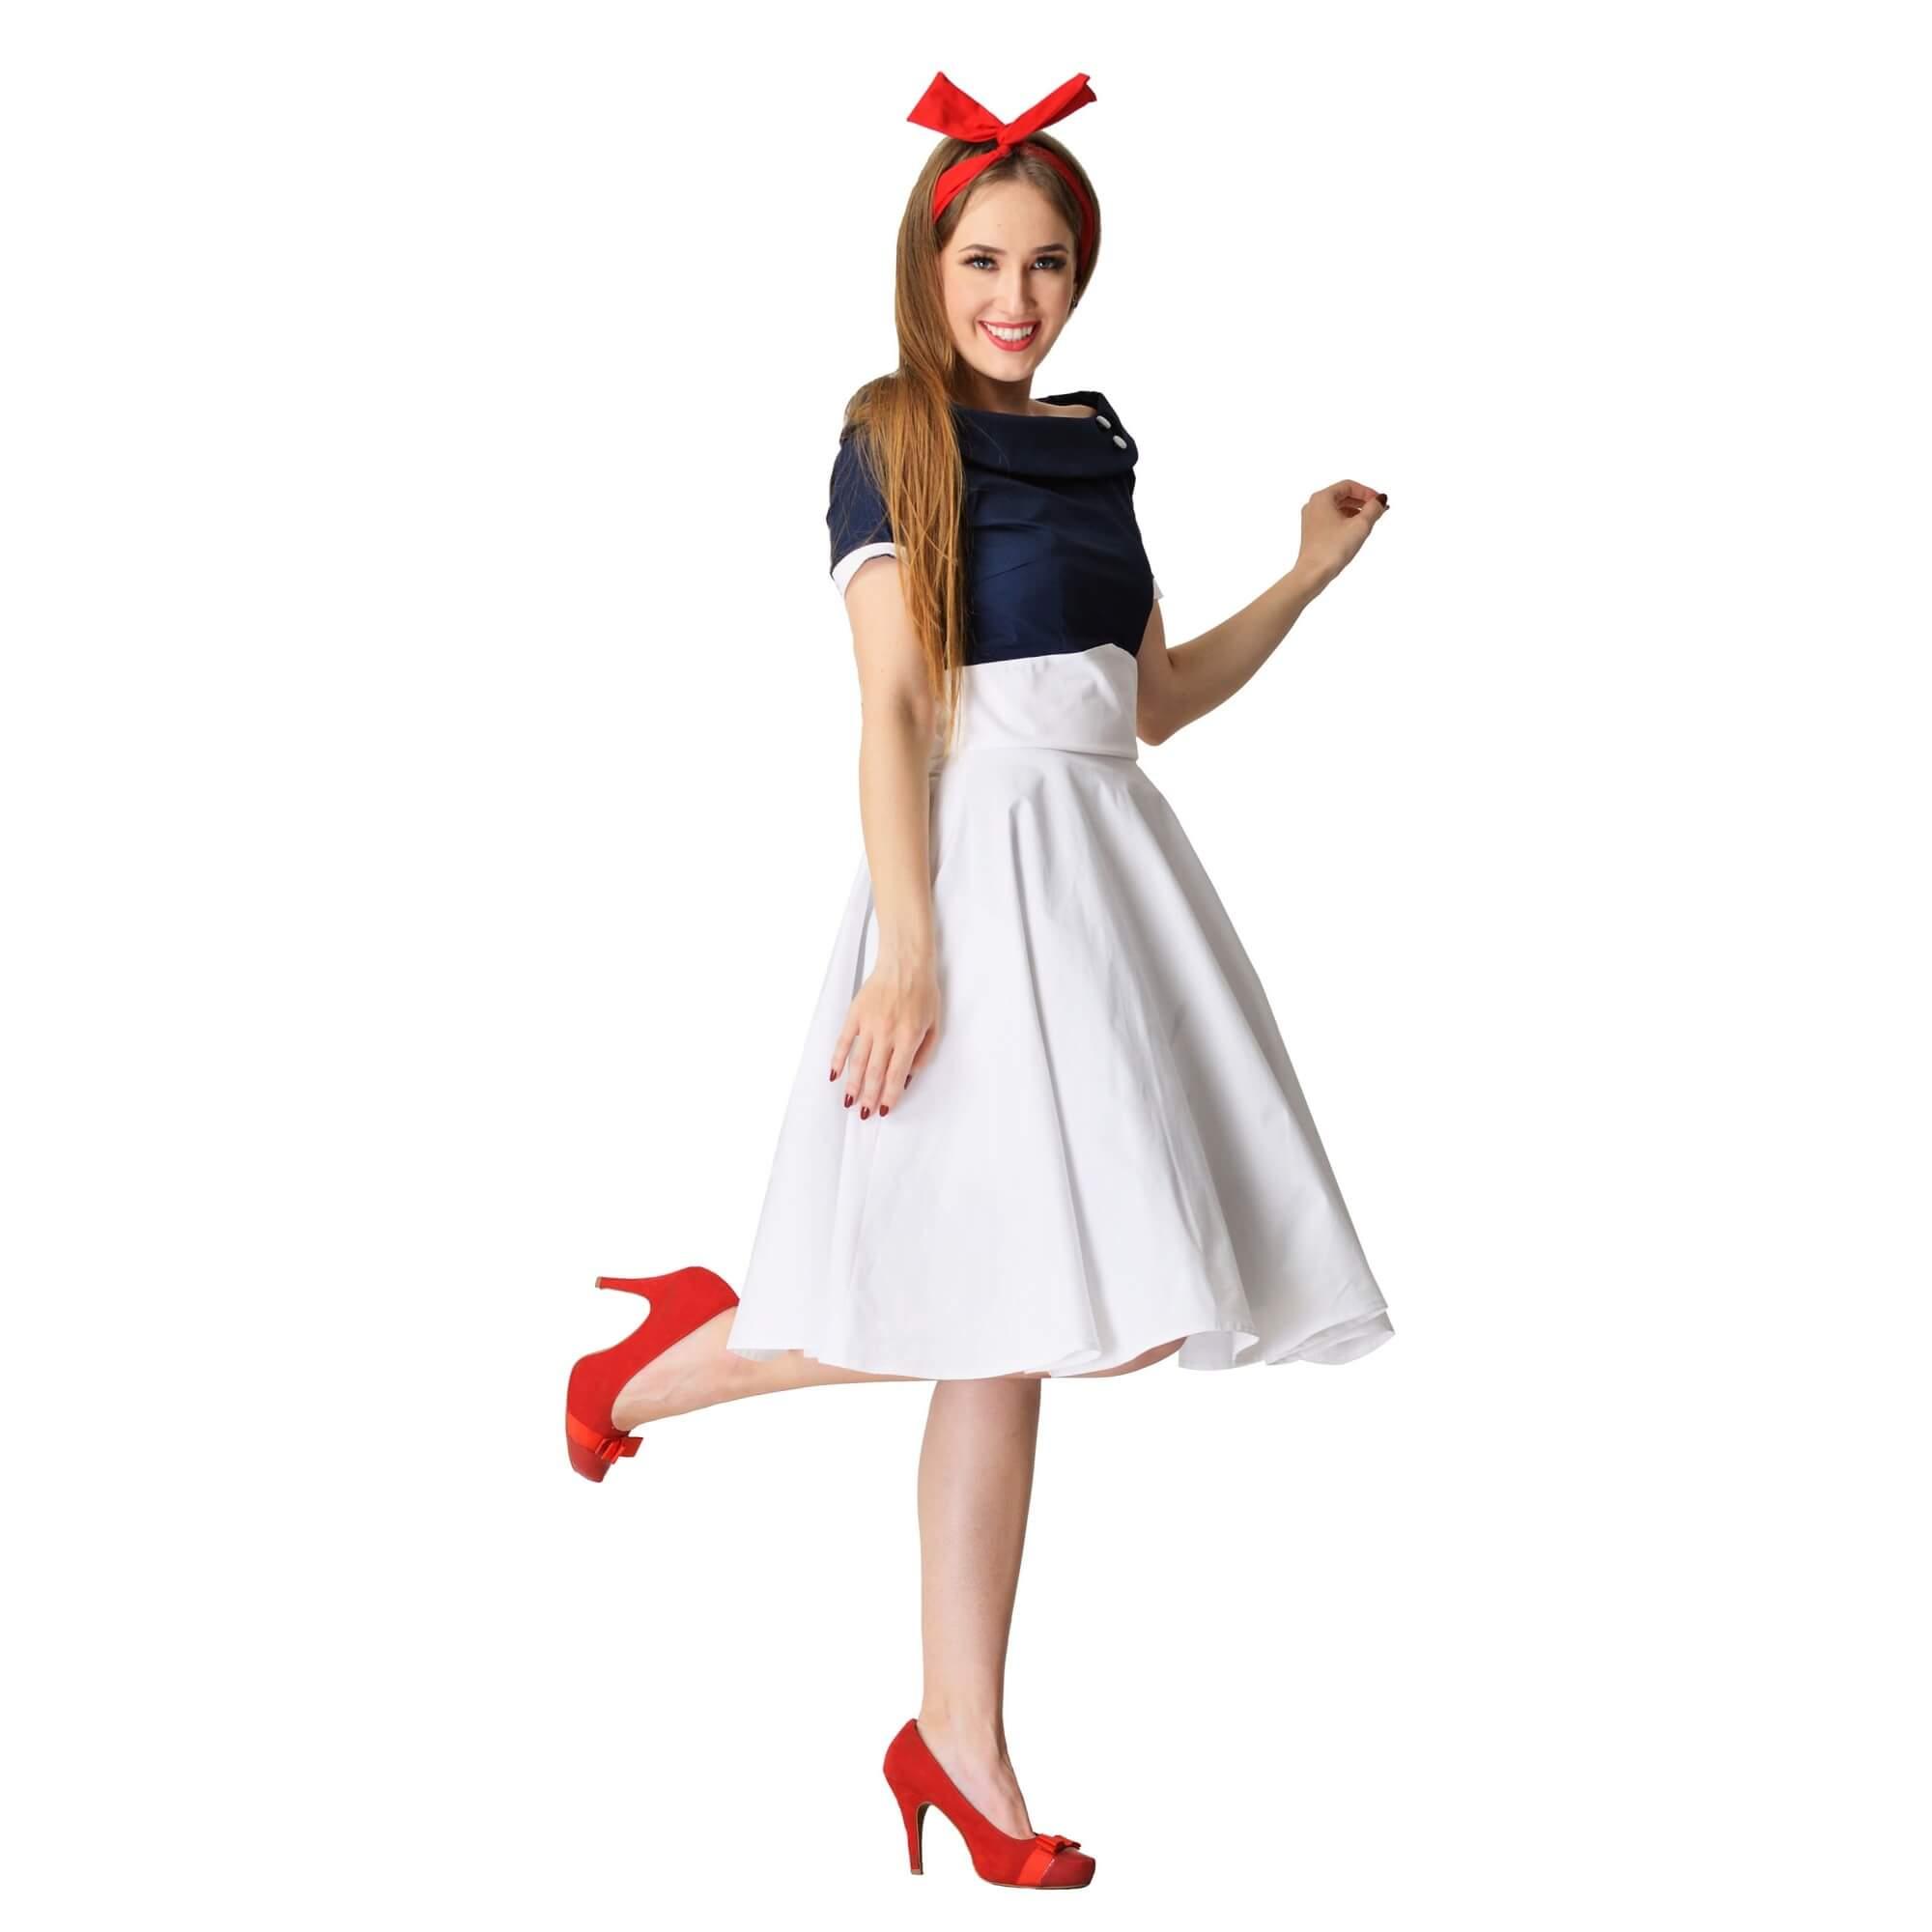 krasne retro šaty modro biele